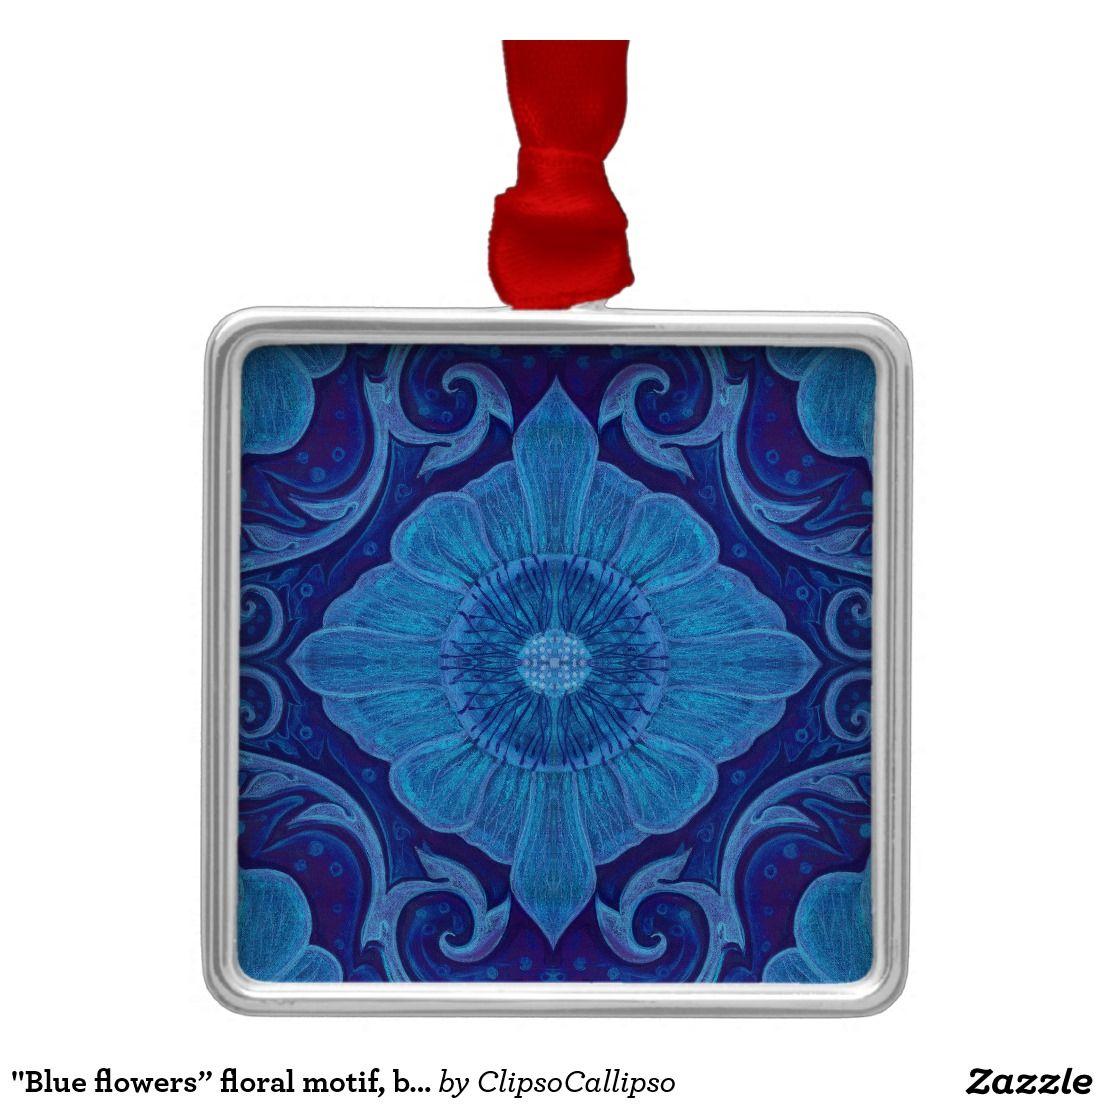 """Blue flowers"" floral motif, bohemian pattern Metal Ornament #blue, #navy+blue, #dark+blue, #royal+blue, #cerulean, #azure, #cobalt, #ultramarine, #lapis, #cornflower, #floral, #flower, #pattern, #bohemian, #pattern, #ornament, #ornamental, #flourishing, #blooming, #bloom,#decorative, #trendy, #70s, #arabesque, #eastern,  #palatial, #plush, #saturated, #colorful, #seamless, #vintage, #design, #motif, #medallion,"